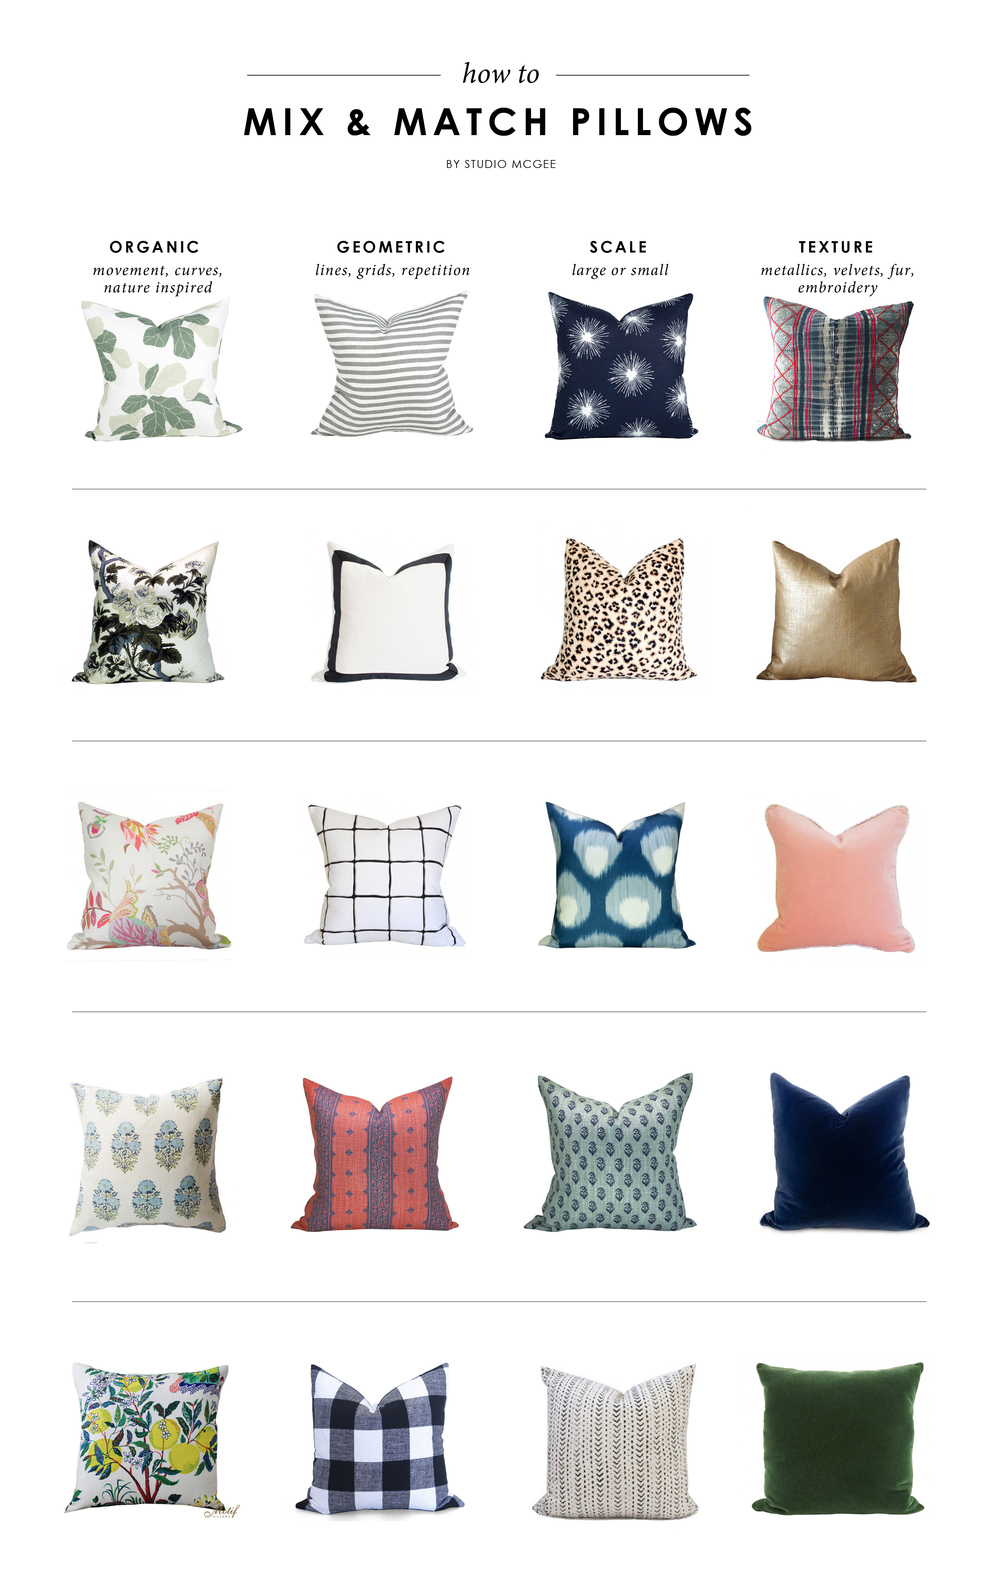 How To Mix & Match Pillows — STUDIO MCGEE